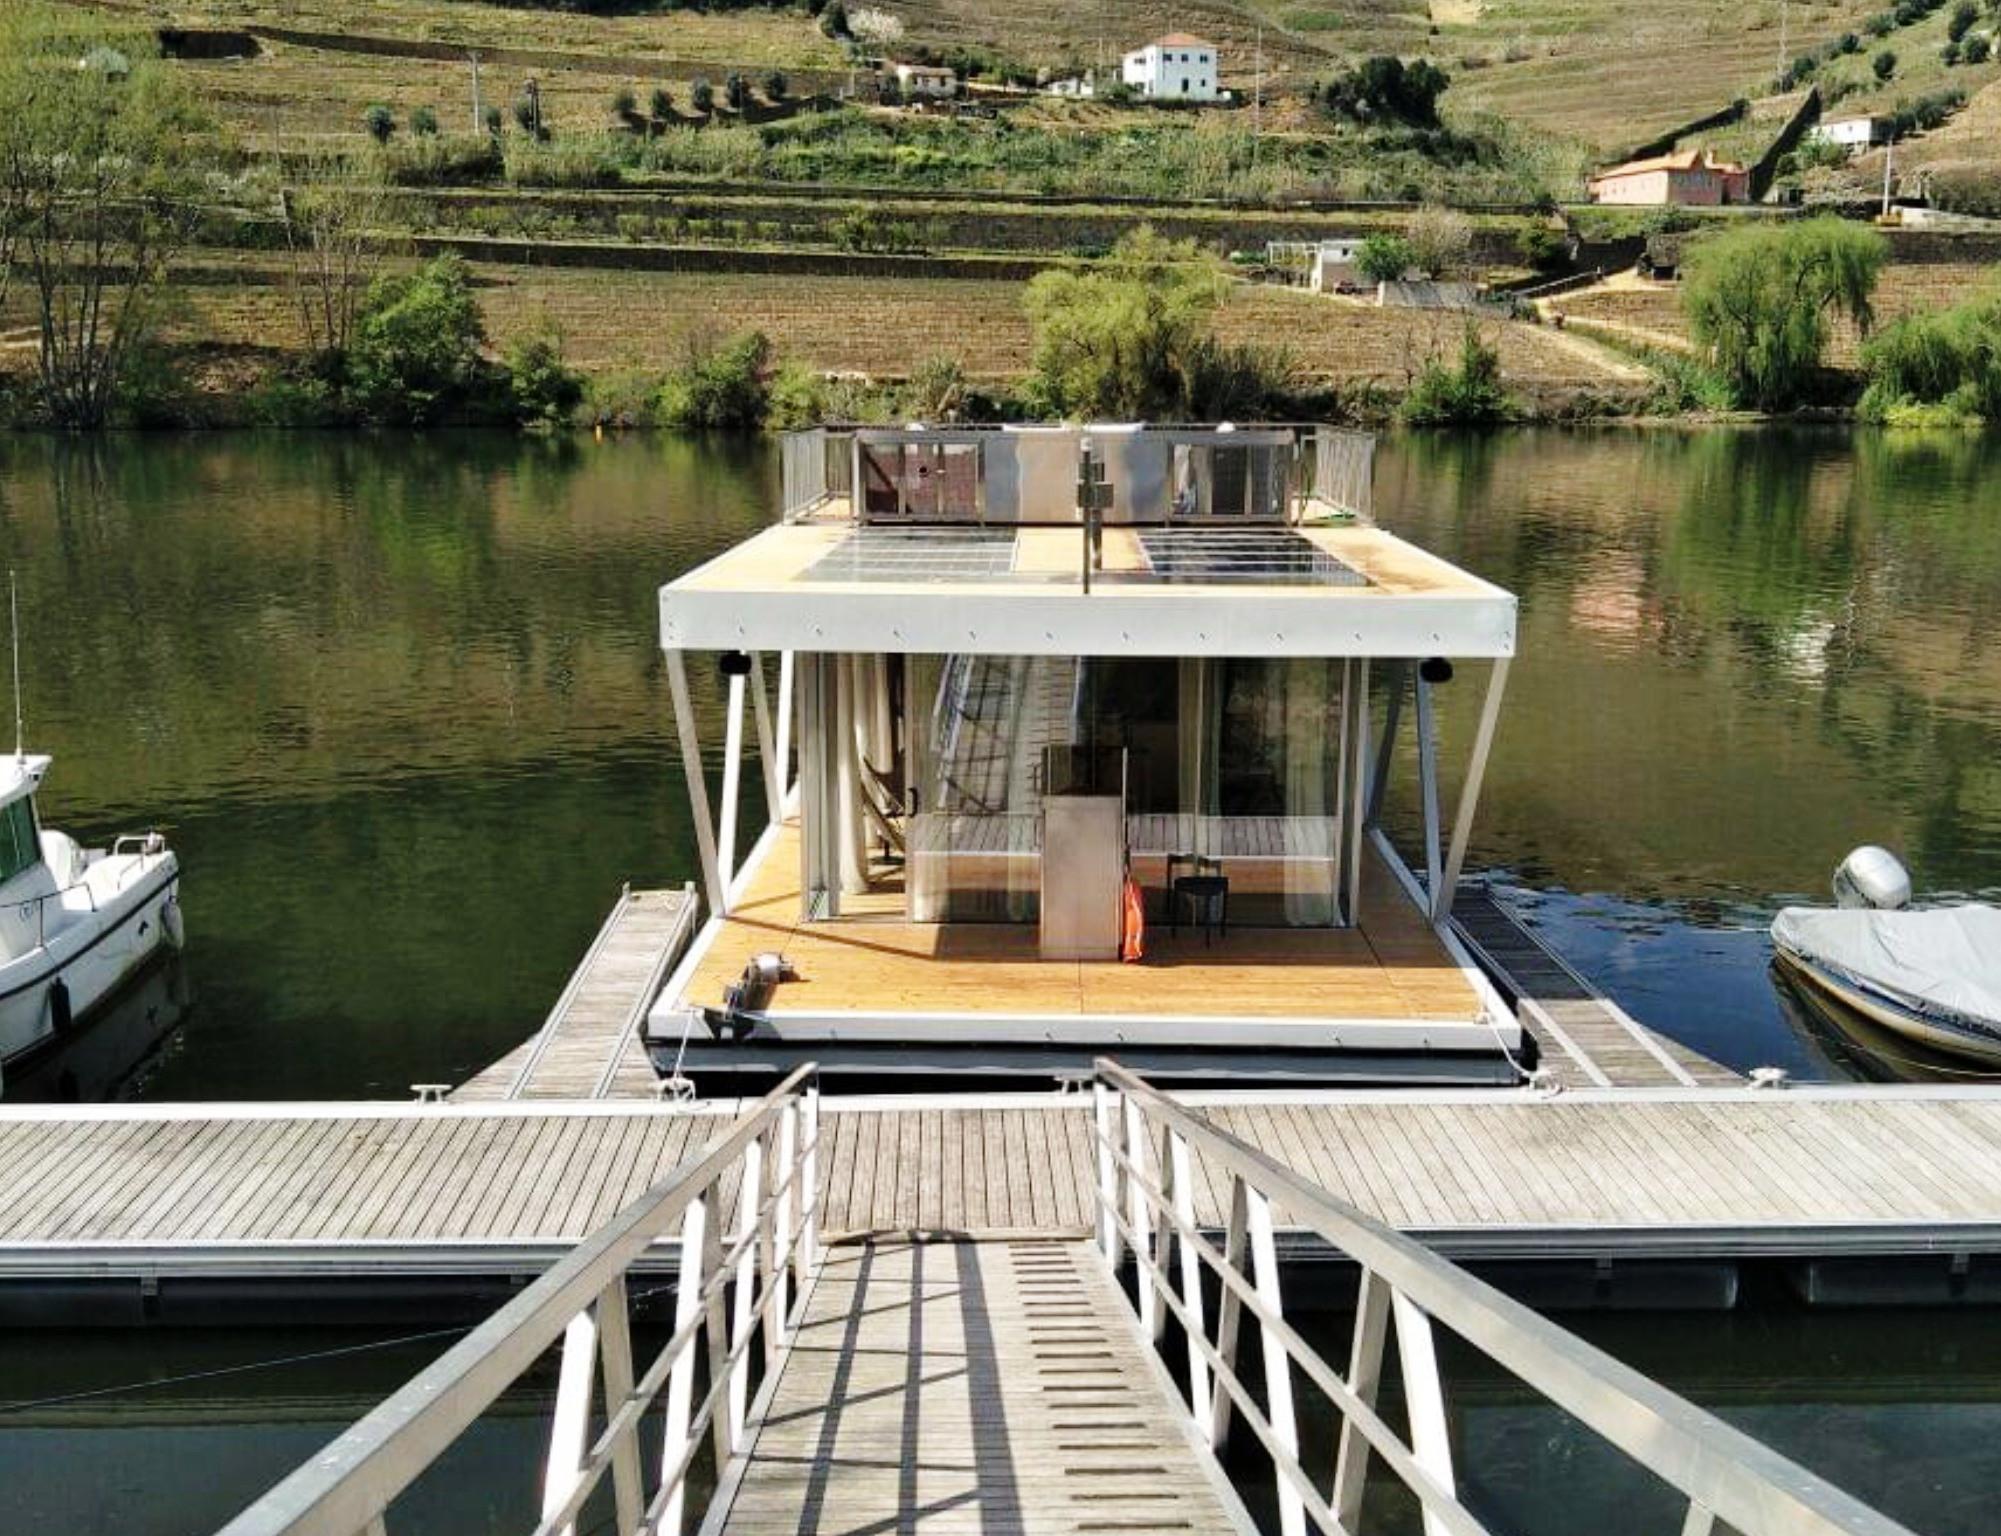 House Boating Portugal - Alqueva